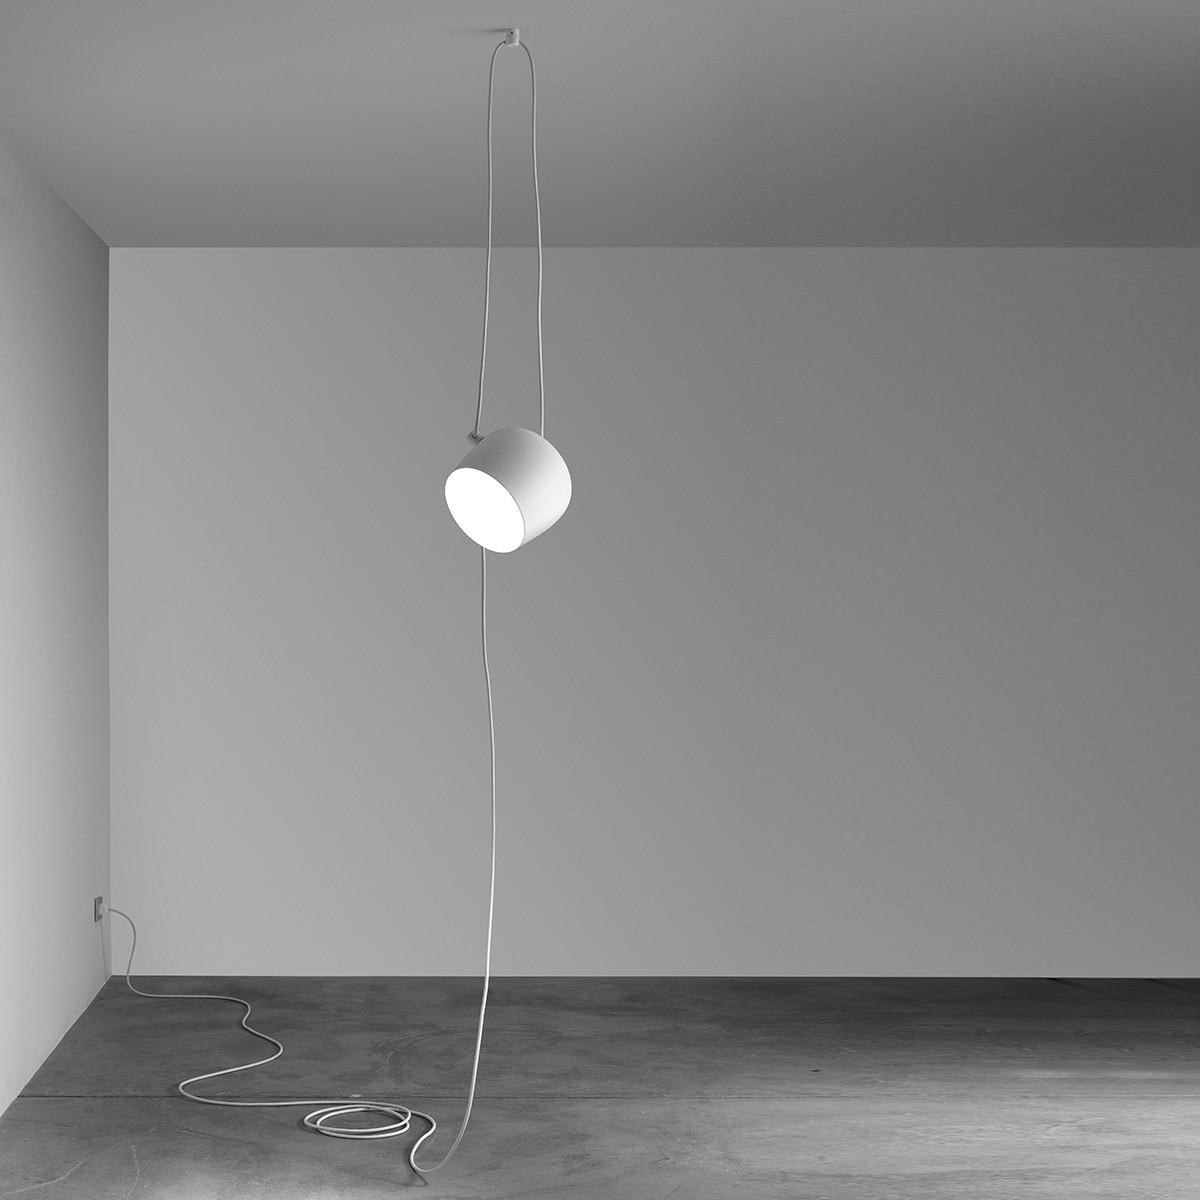 Flos Aim Cable + Plug Pendelleuchte, small, Ø: 17 cm, weiß